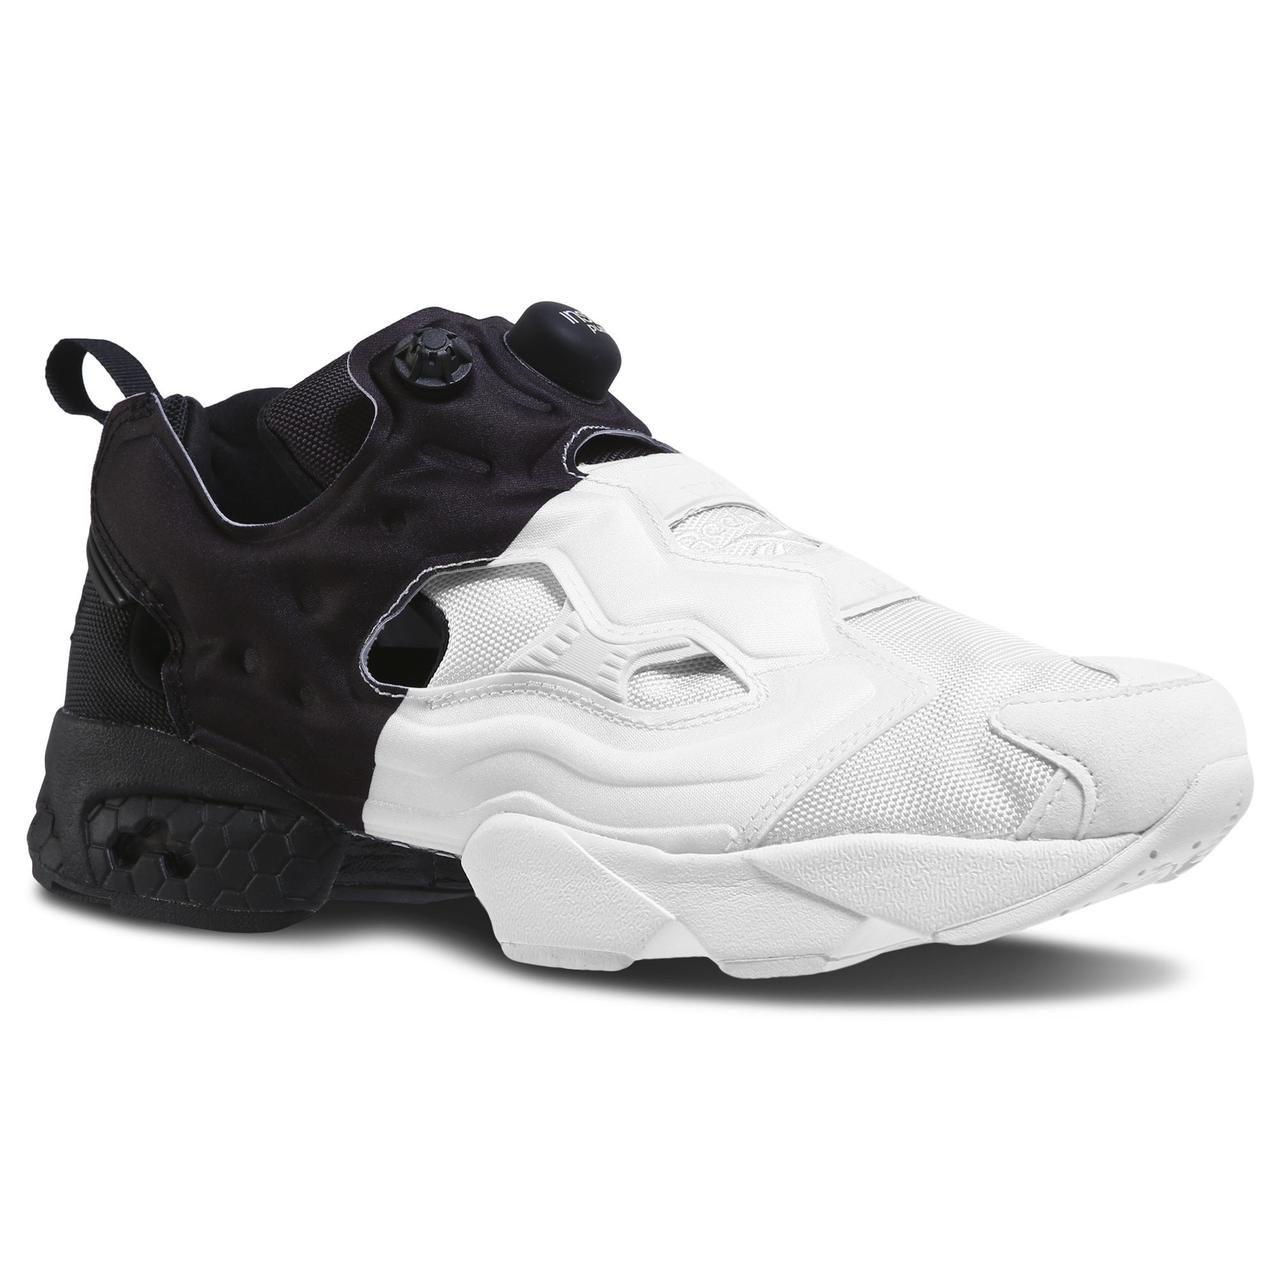 Купить Мужские кроссовки Reebok Classic Instapump Fury OG (Артикул ... b6229f2e2460b